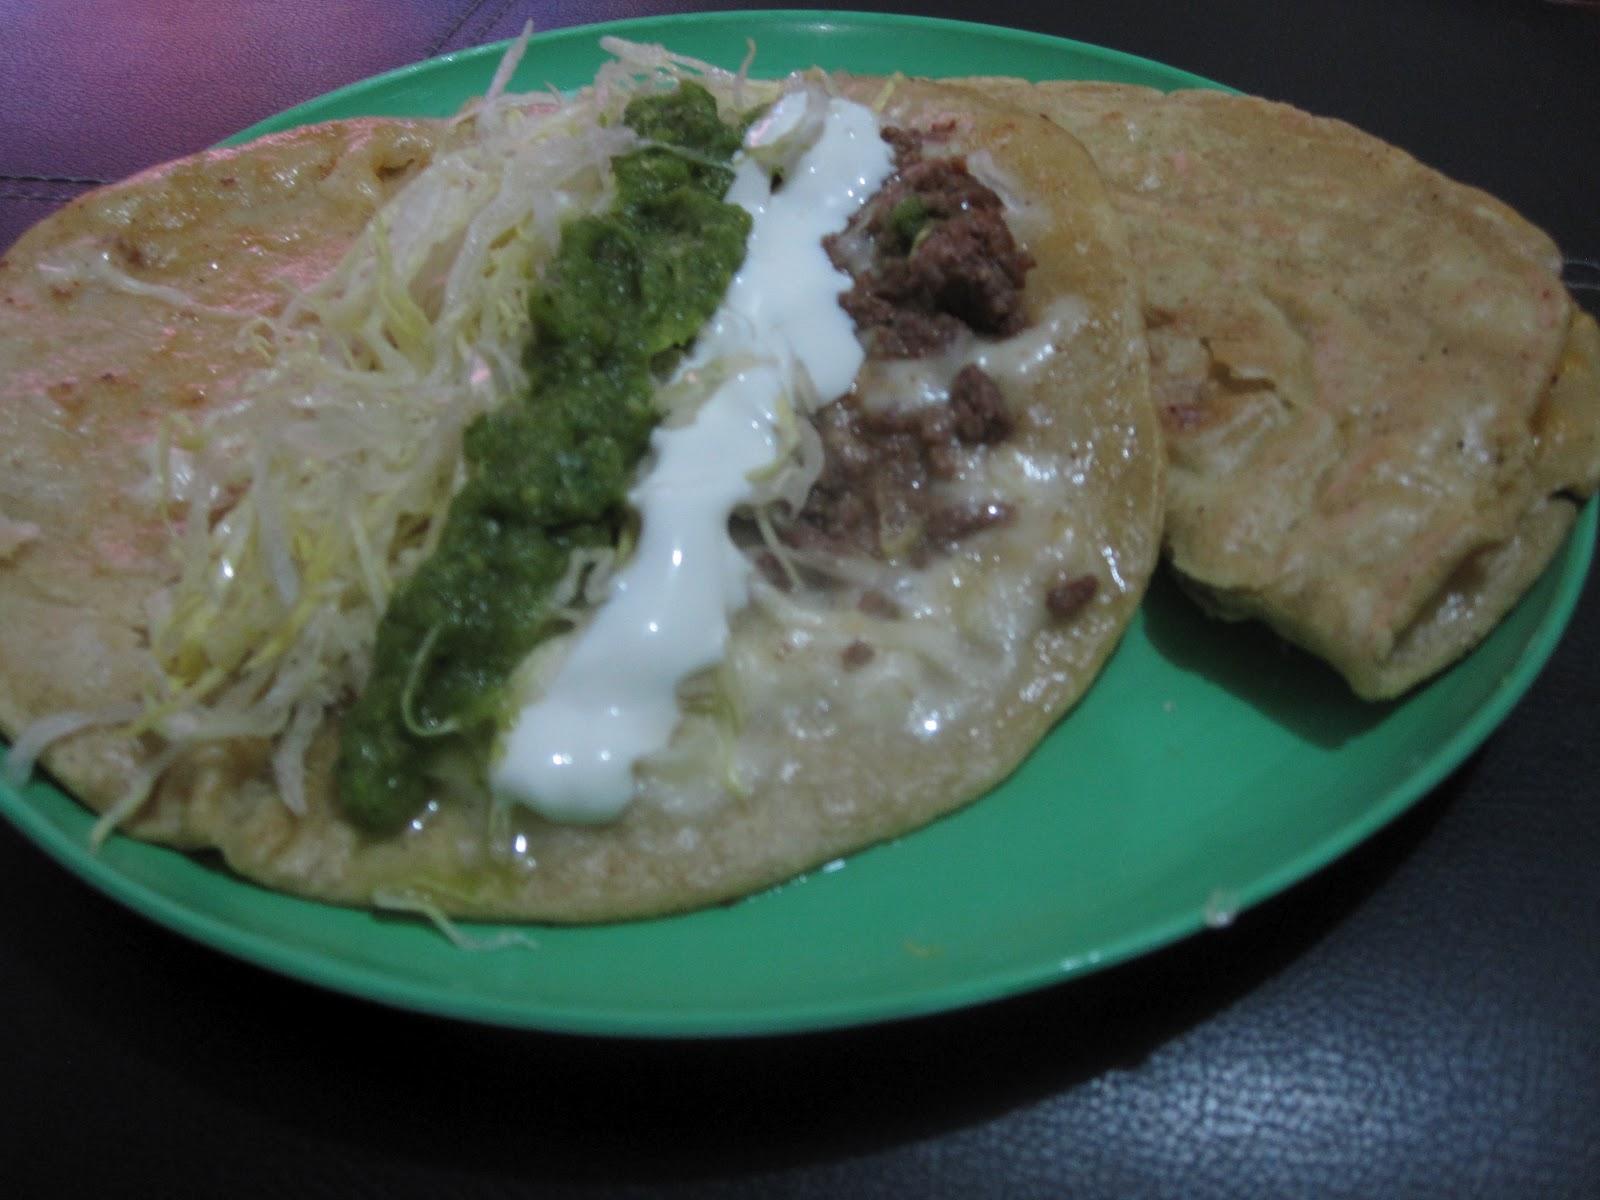 La Gringa Cocina: Quesadillas